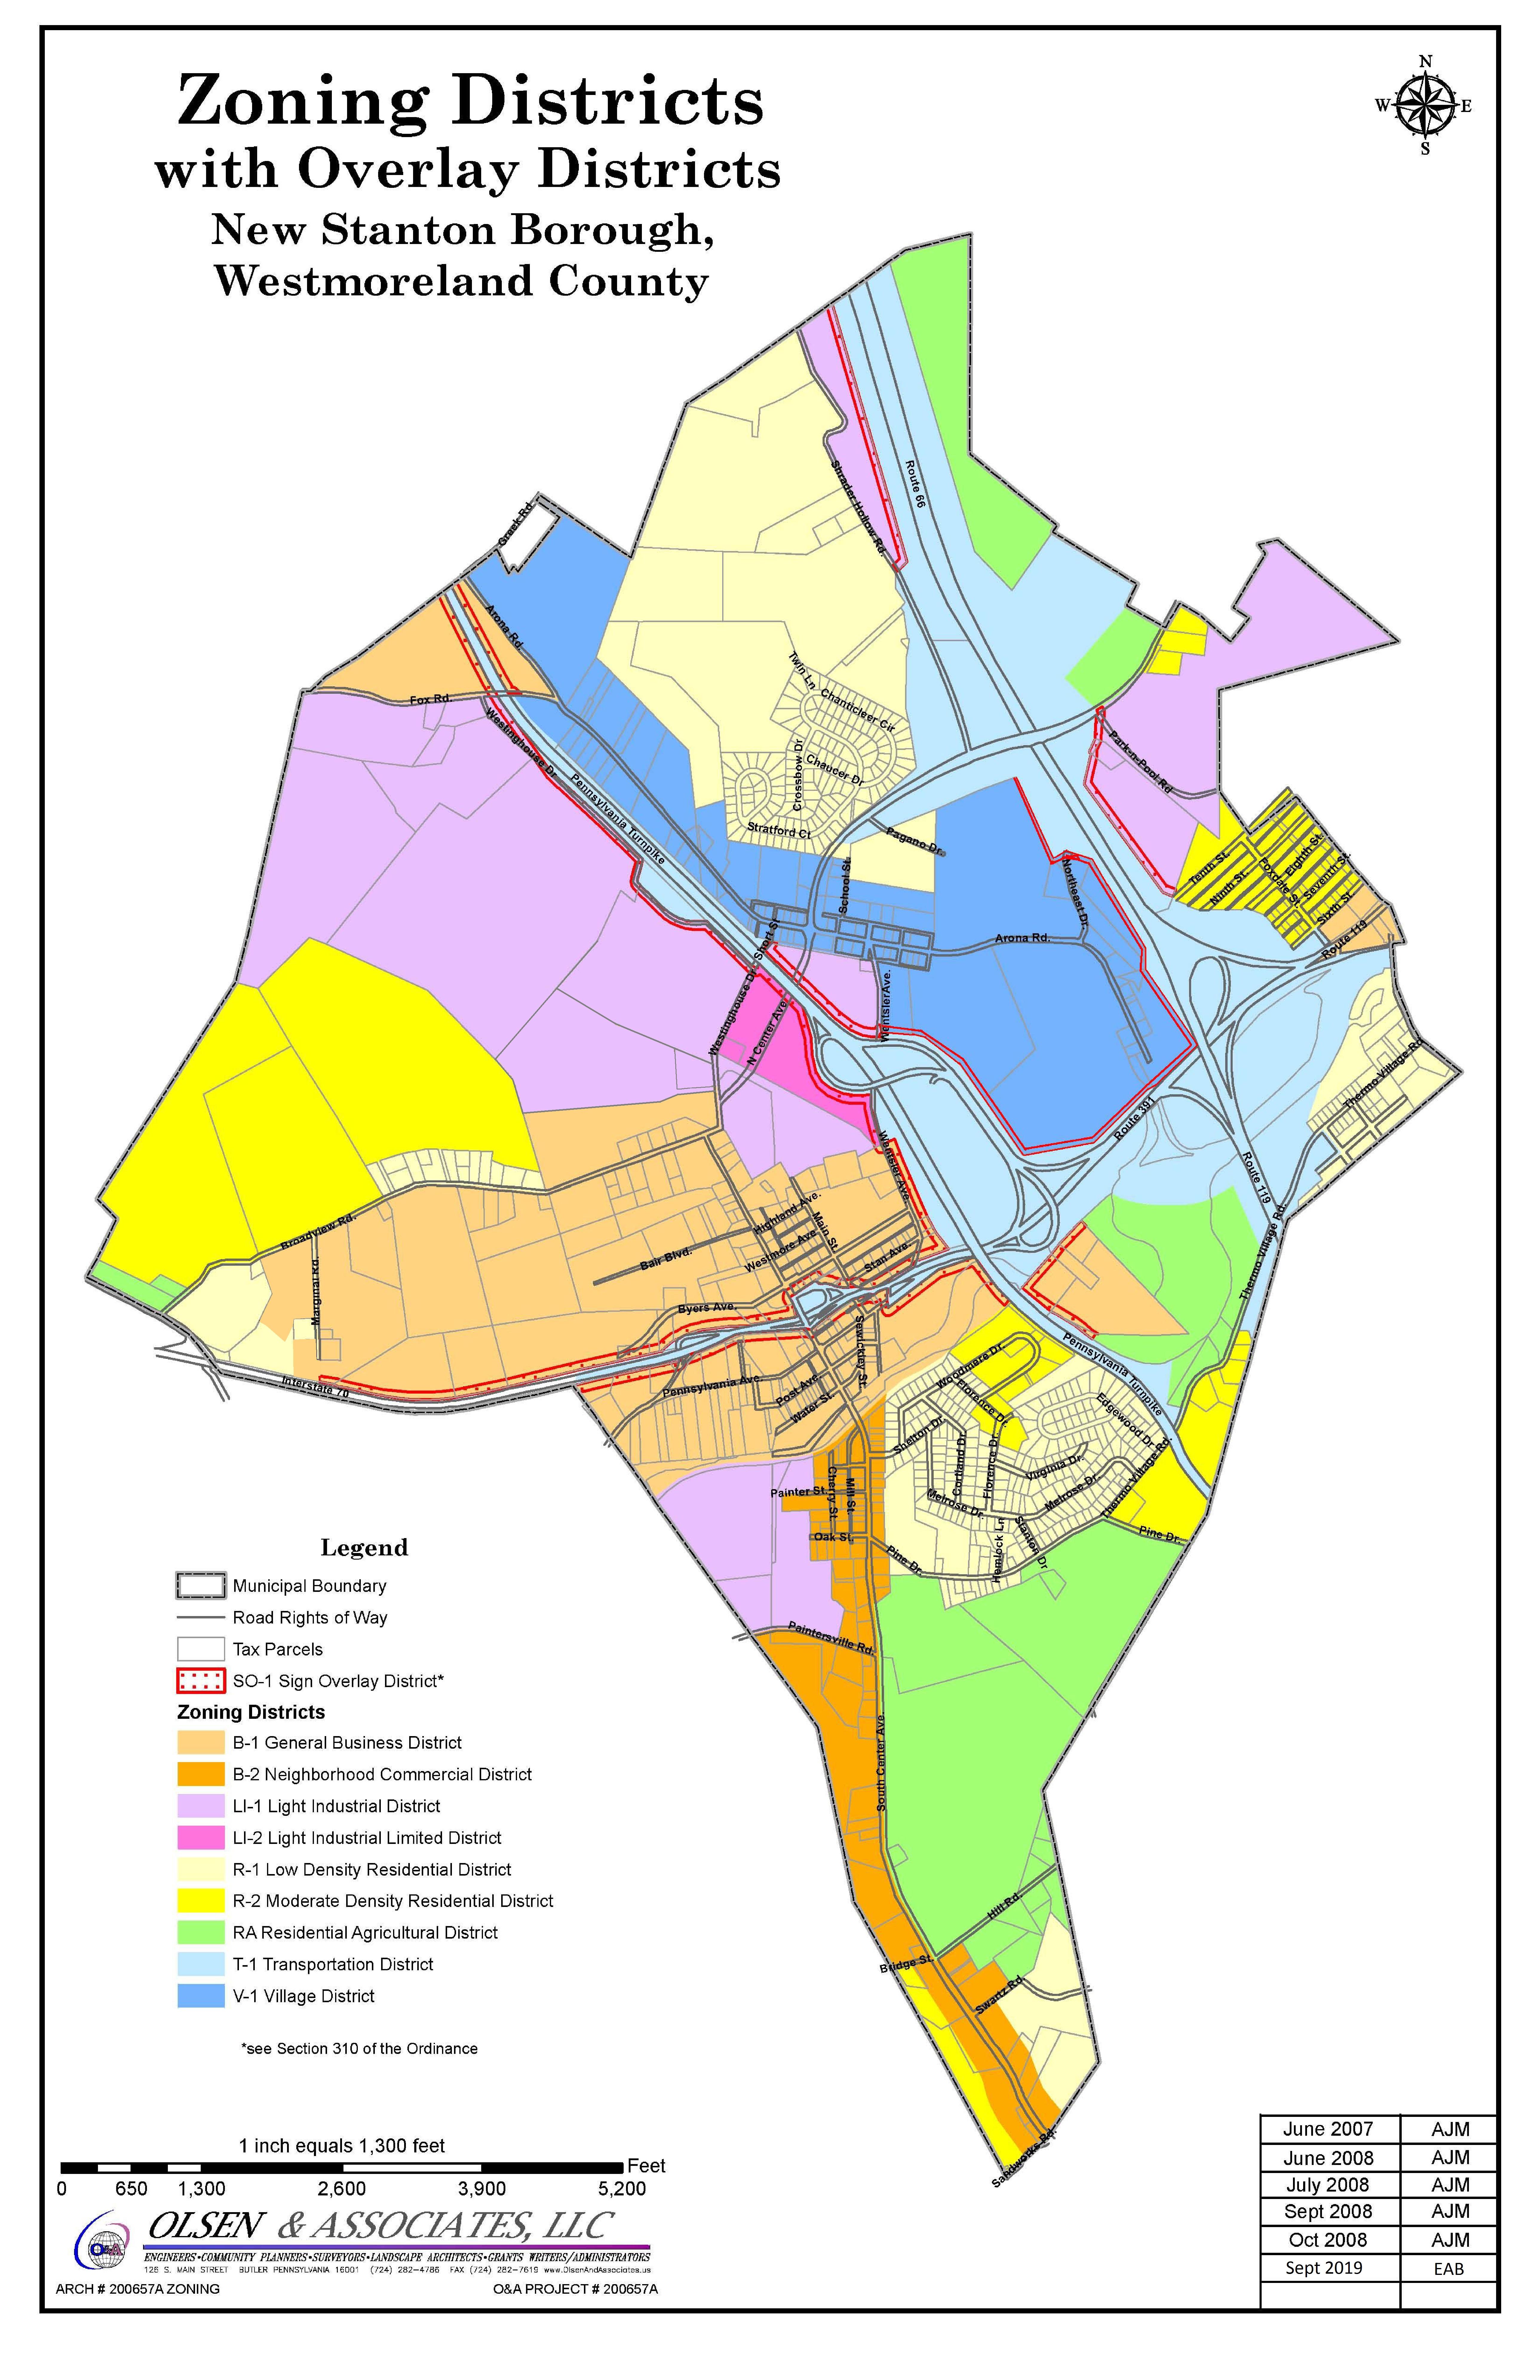 Zoning — New Stanton on state of pa map, cowansville pa map, schuylkill river pa map, north strabane pa map, baldwin pa map, manns choice pa map, york pa map, centre hall pa map, huntingdon valley pa map, emporium pa map, bear rocks pa map, bucks co pa map, south hills pa map, karns city pa map, barkeyville pa map, red land pa map, hilliards pa map, greensburg pa map, rosslyn farms pa map, east pittsburgh pa map,